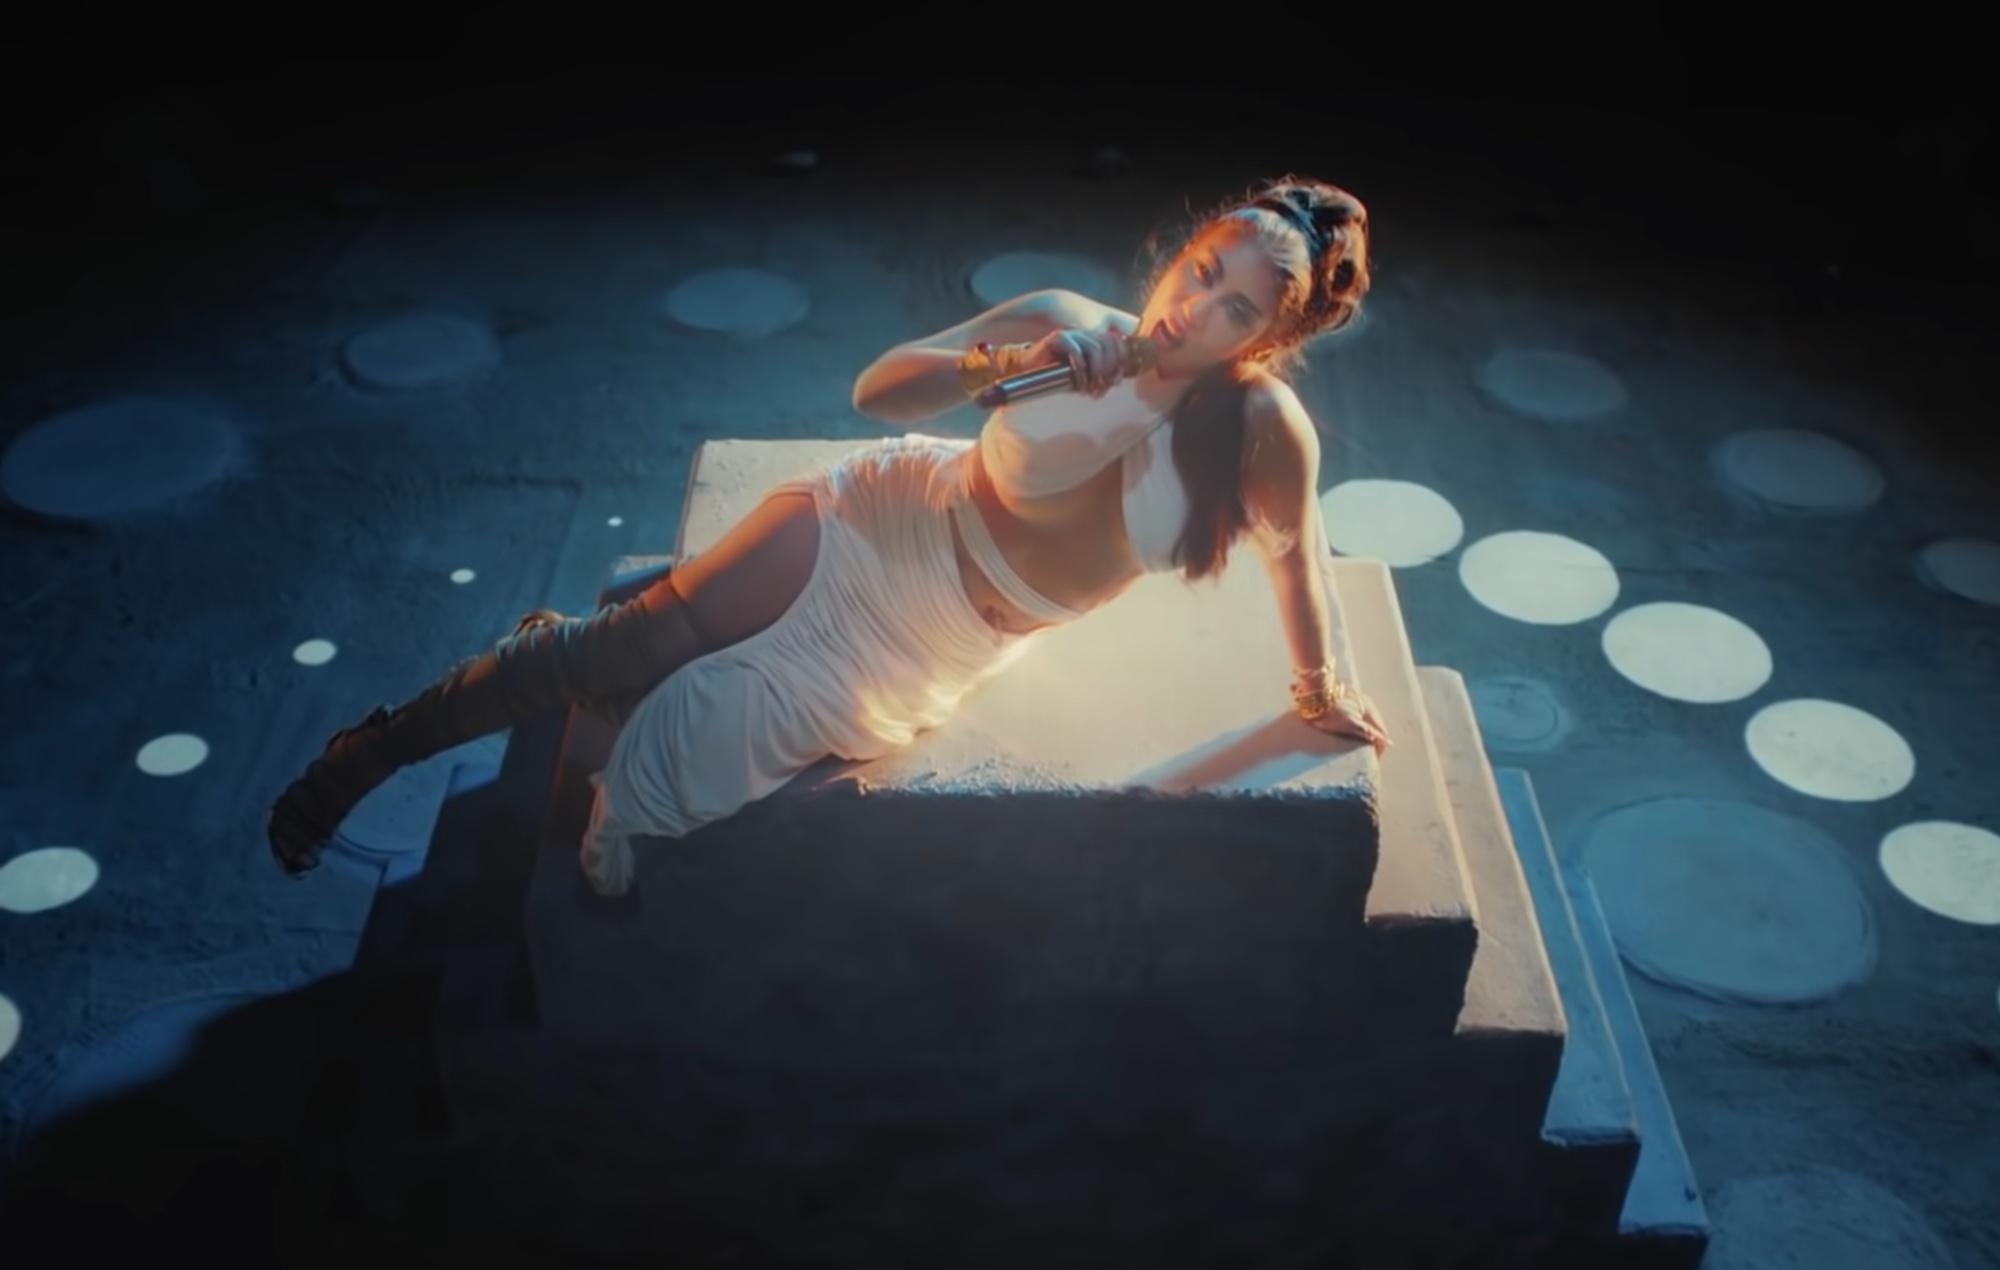 Watch Kali Uchis bring new single 'Telepatía' to 'Fallon'